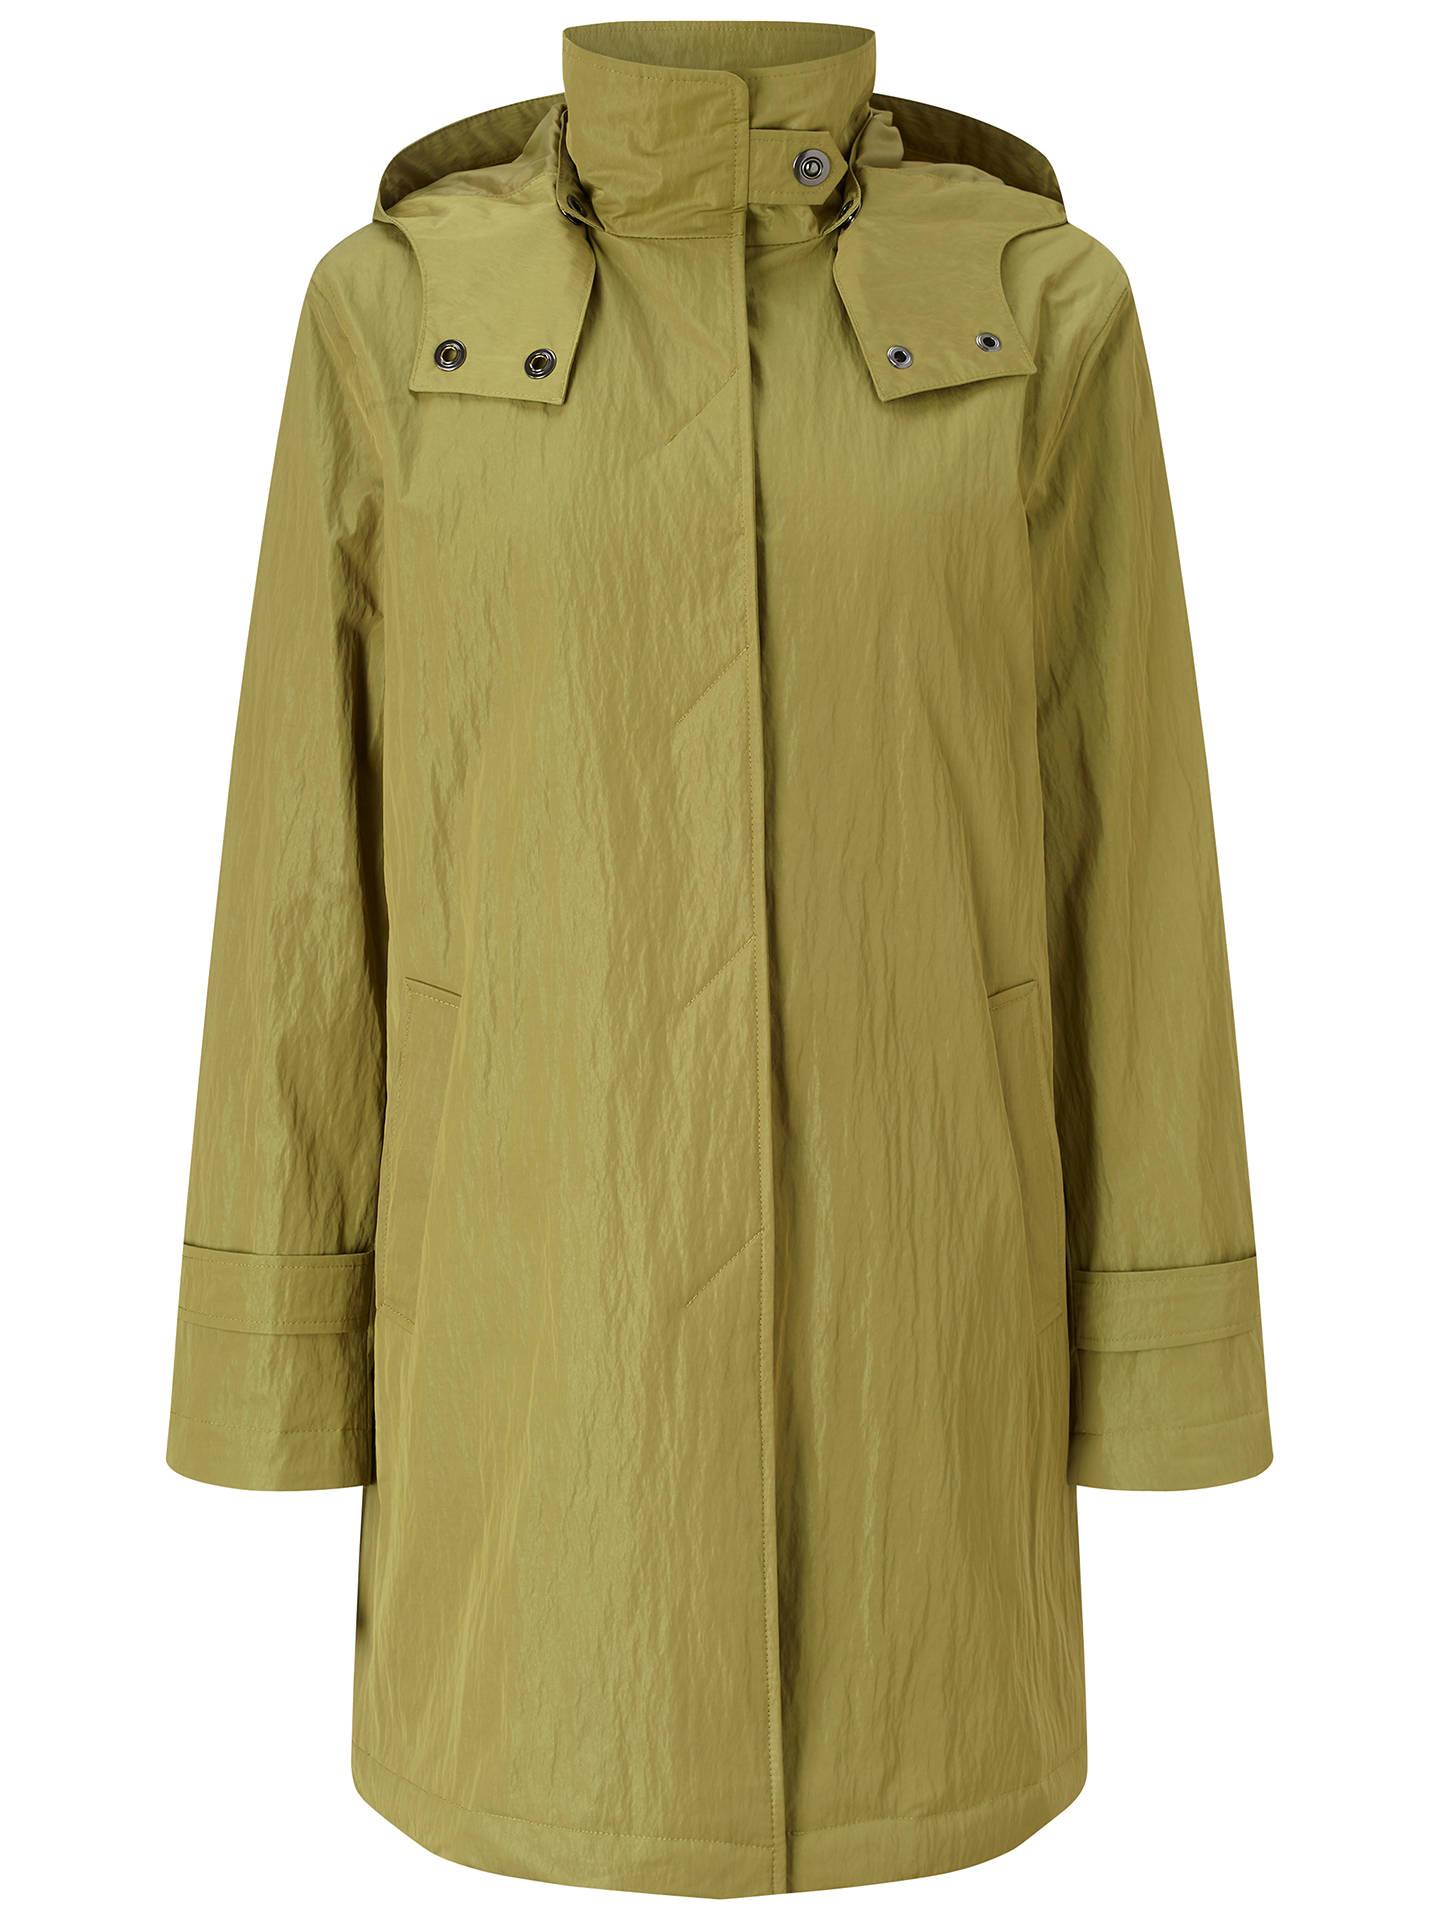 diversified latest designs later popular stores Four Seasons Caban Raincoat at John Lewis & Partners